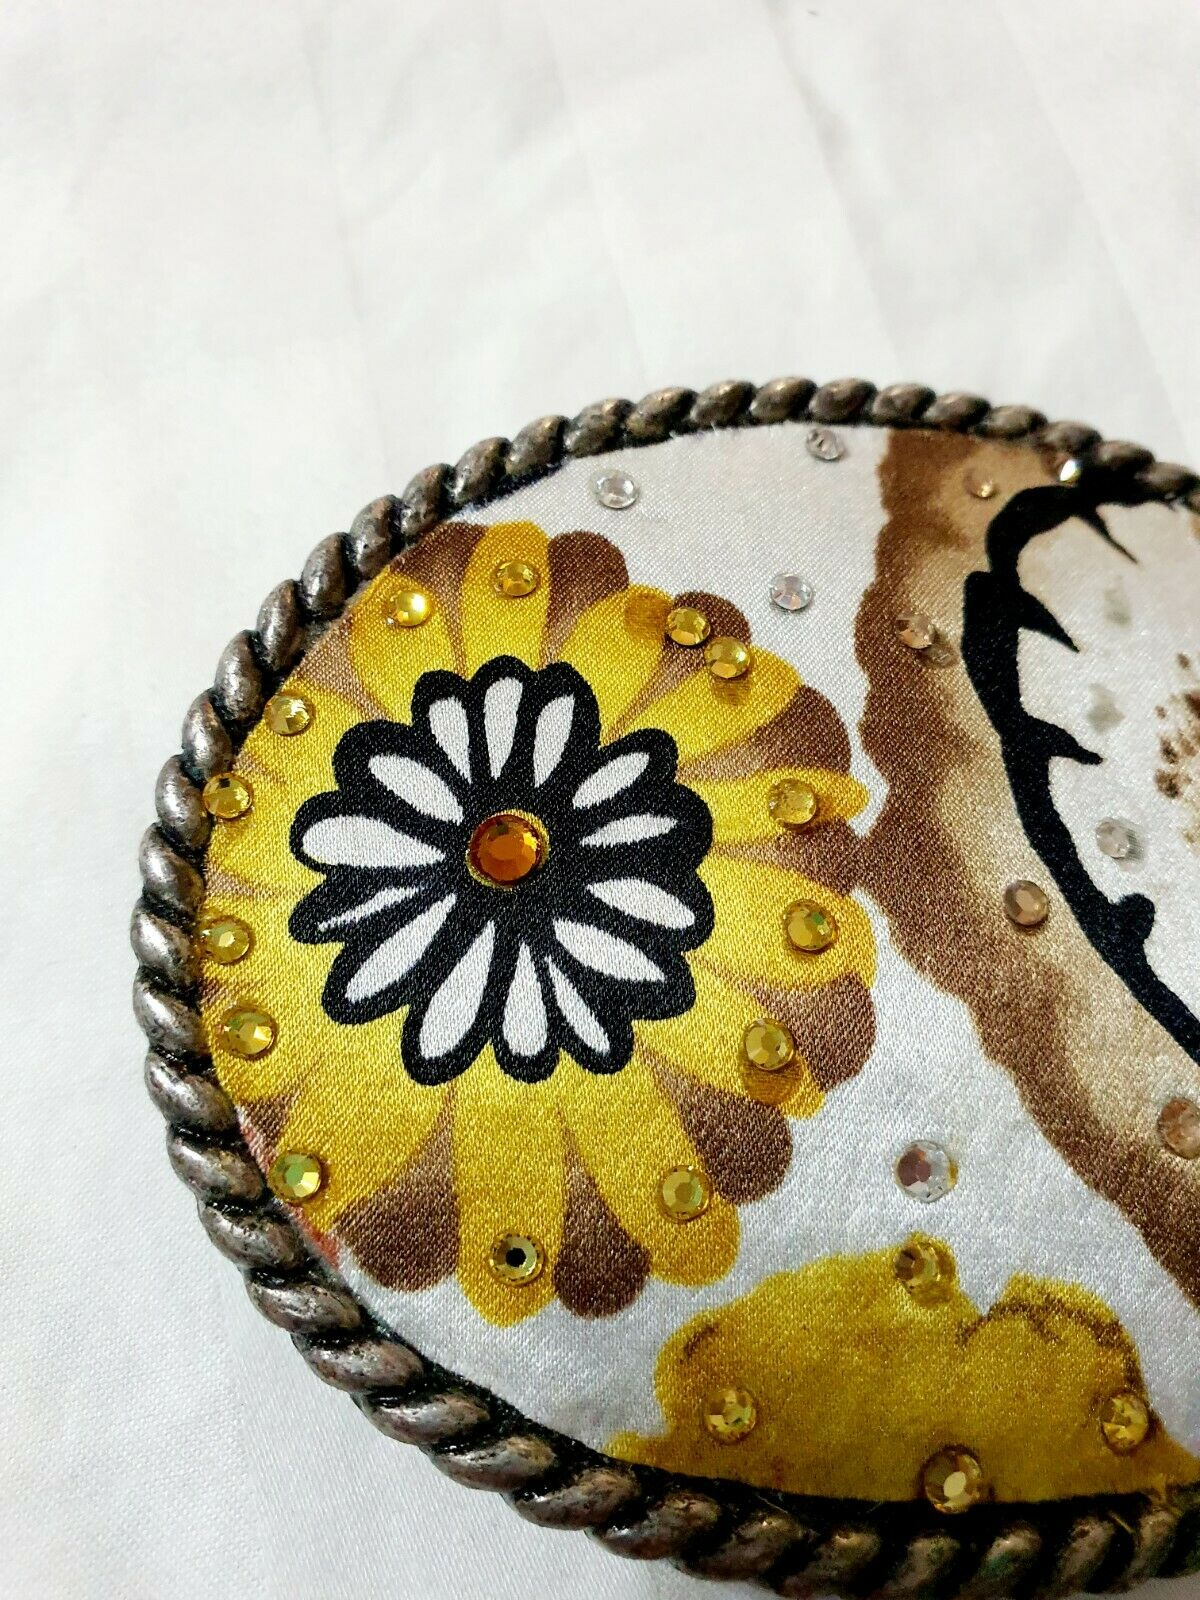 Floral Rhinestone Embellished Oval Belt Buckle White Yellow